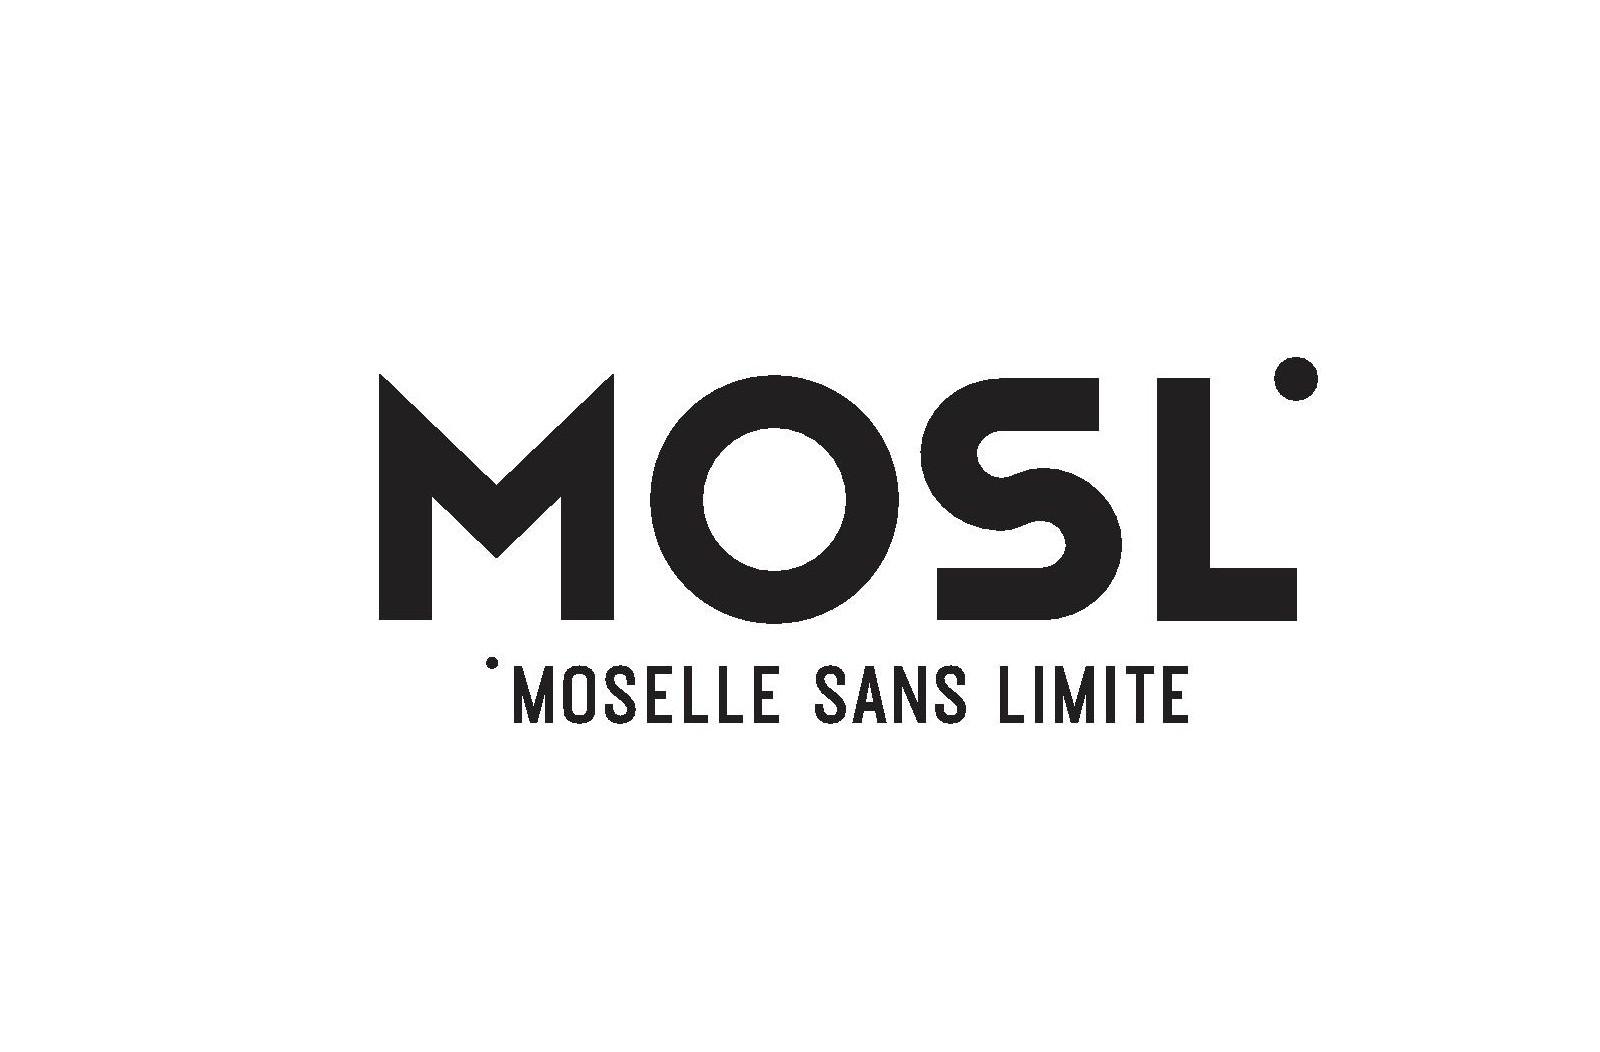 La Moselle lance MOSL, sa marque de territoire (vidéo)